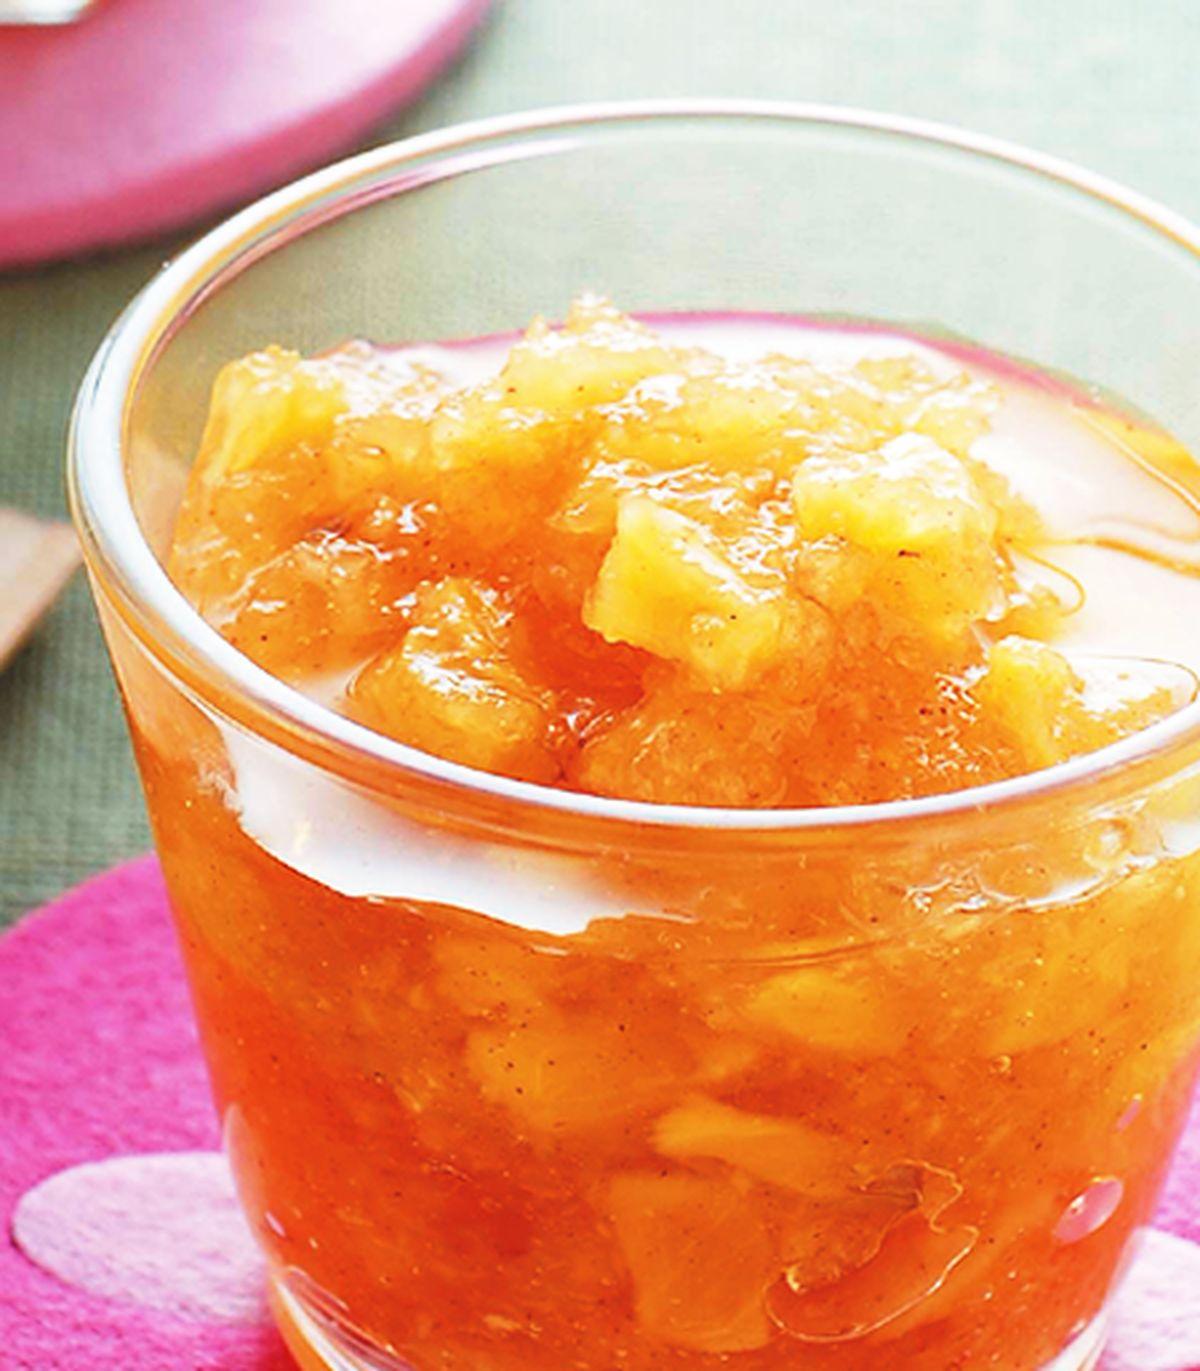 【食譜】鳳梨果醬(3):www.ytower.com.tw